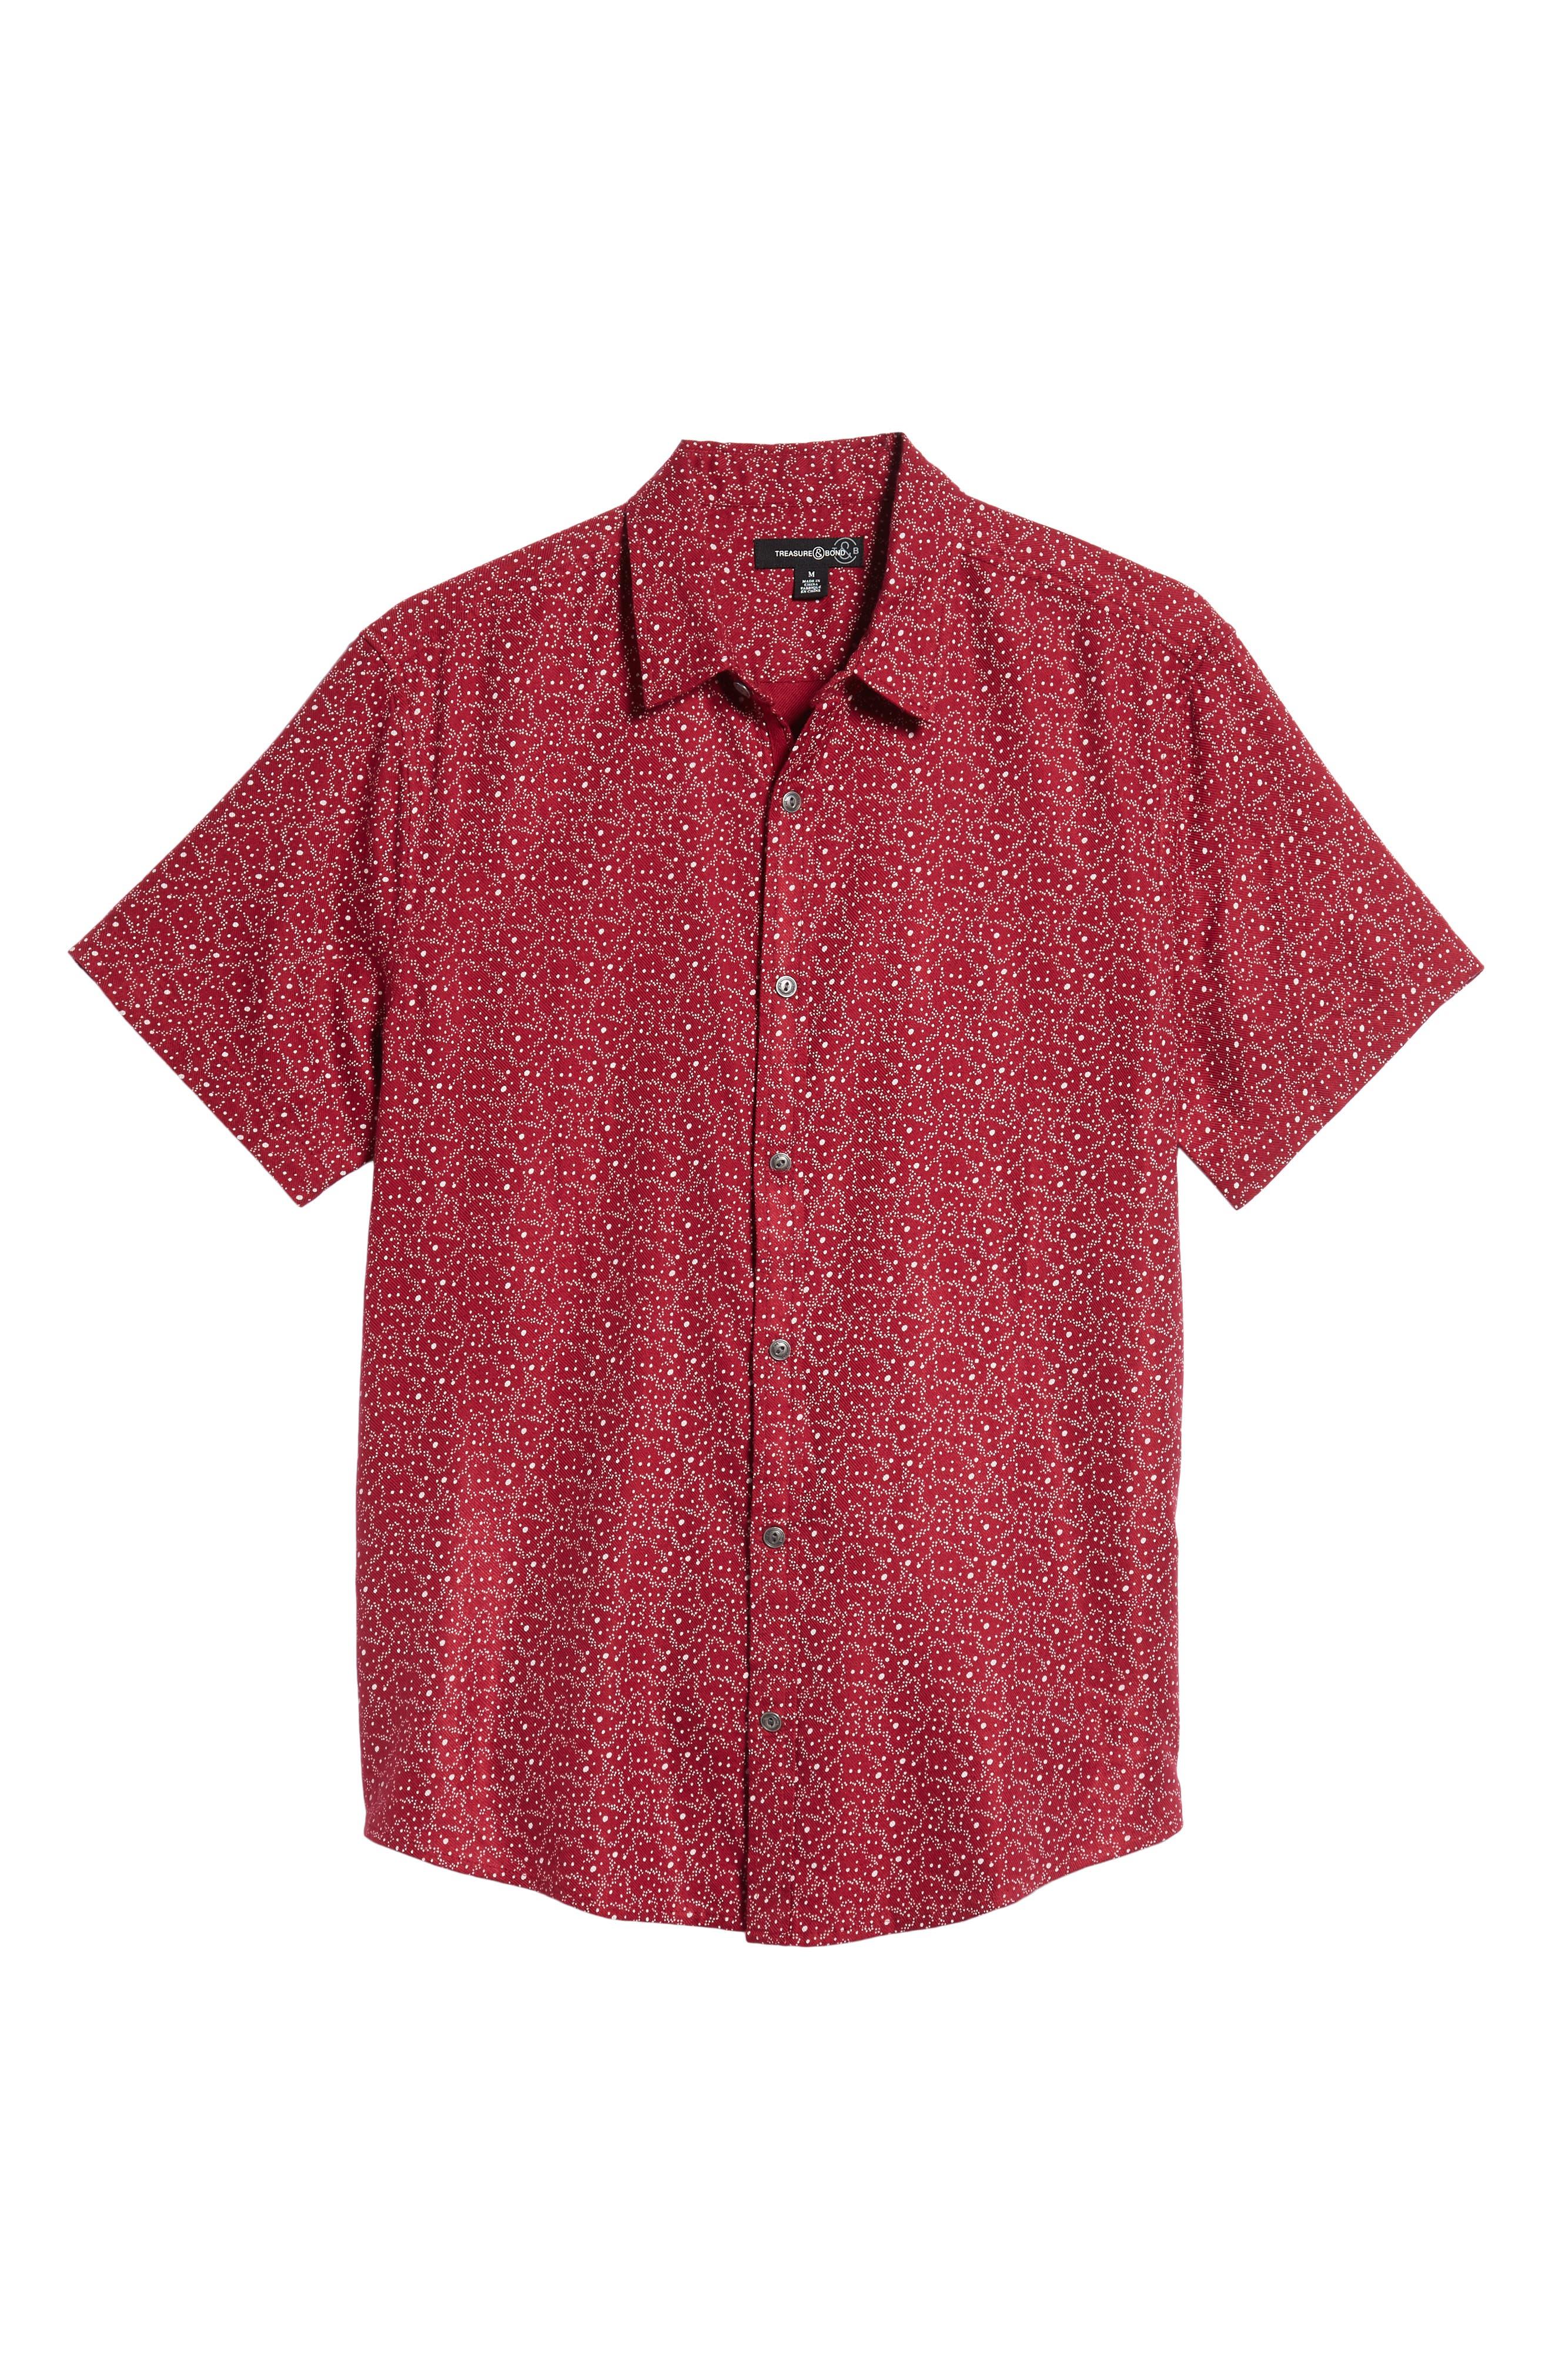 Trim Fit Print Sport Shirt,                             Alternate thumbnail 6, color,                             RED RUMBA CENTAURI